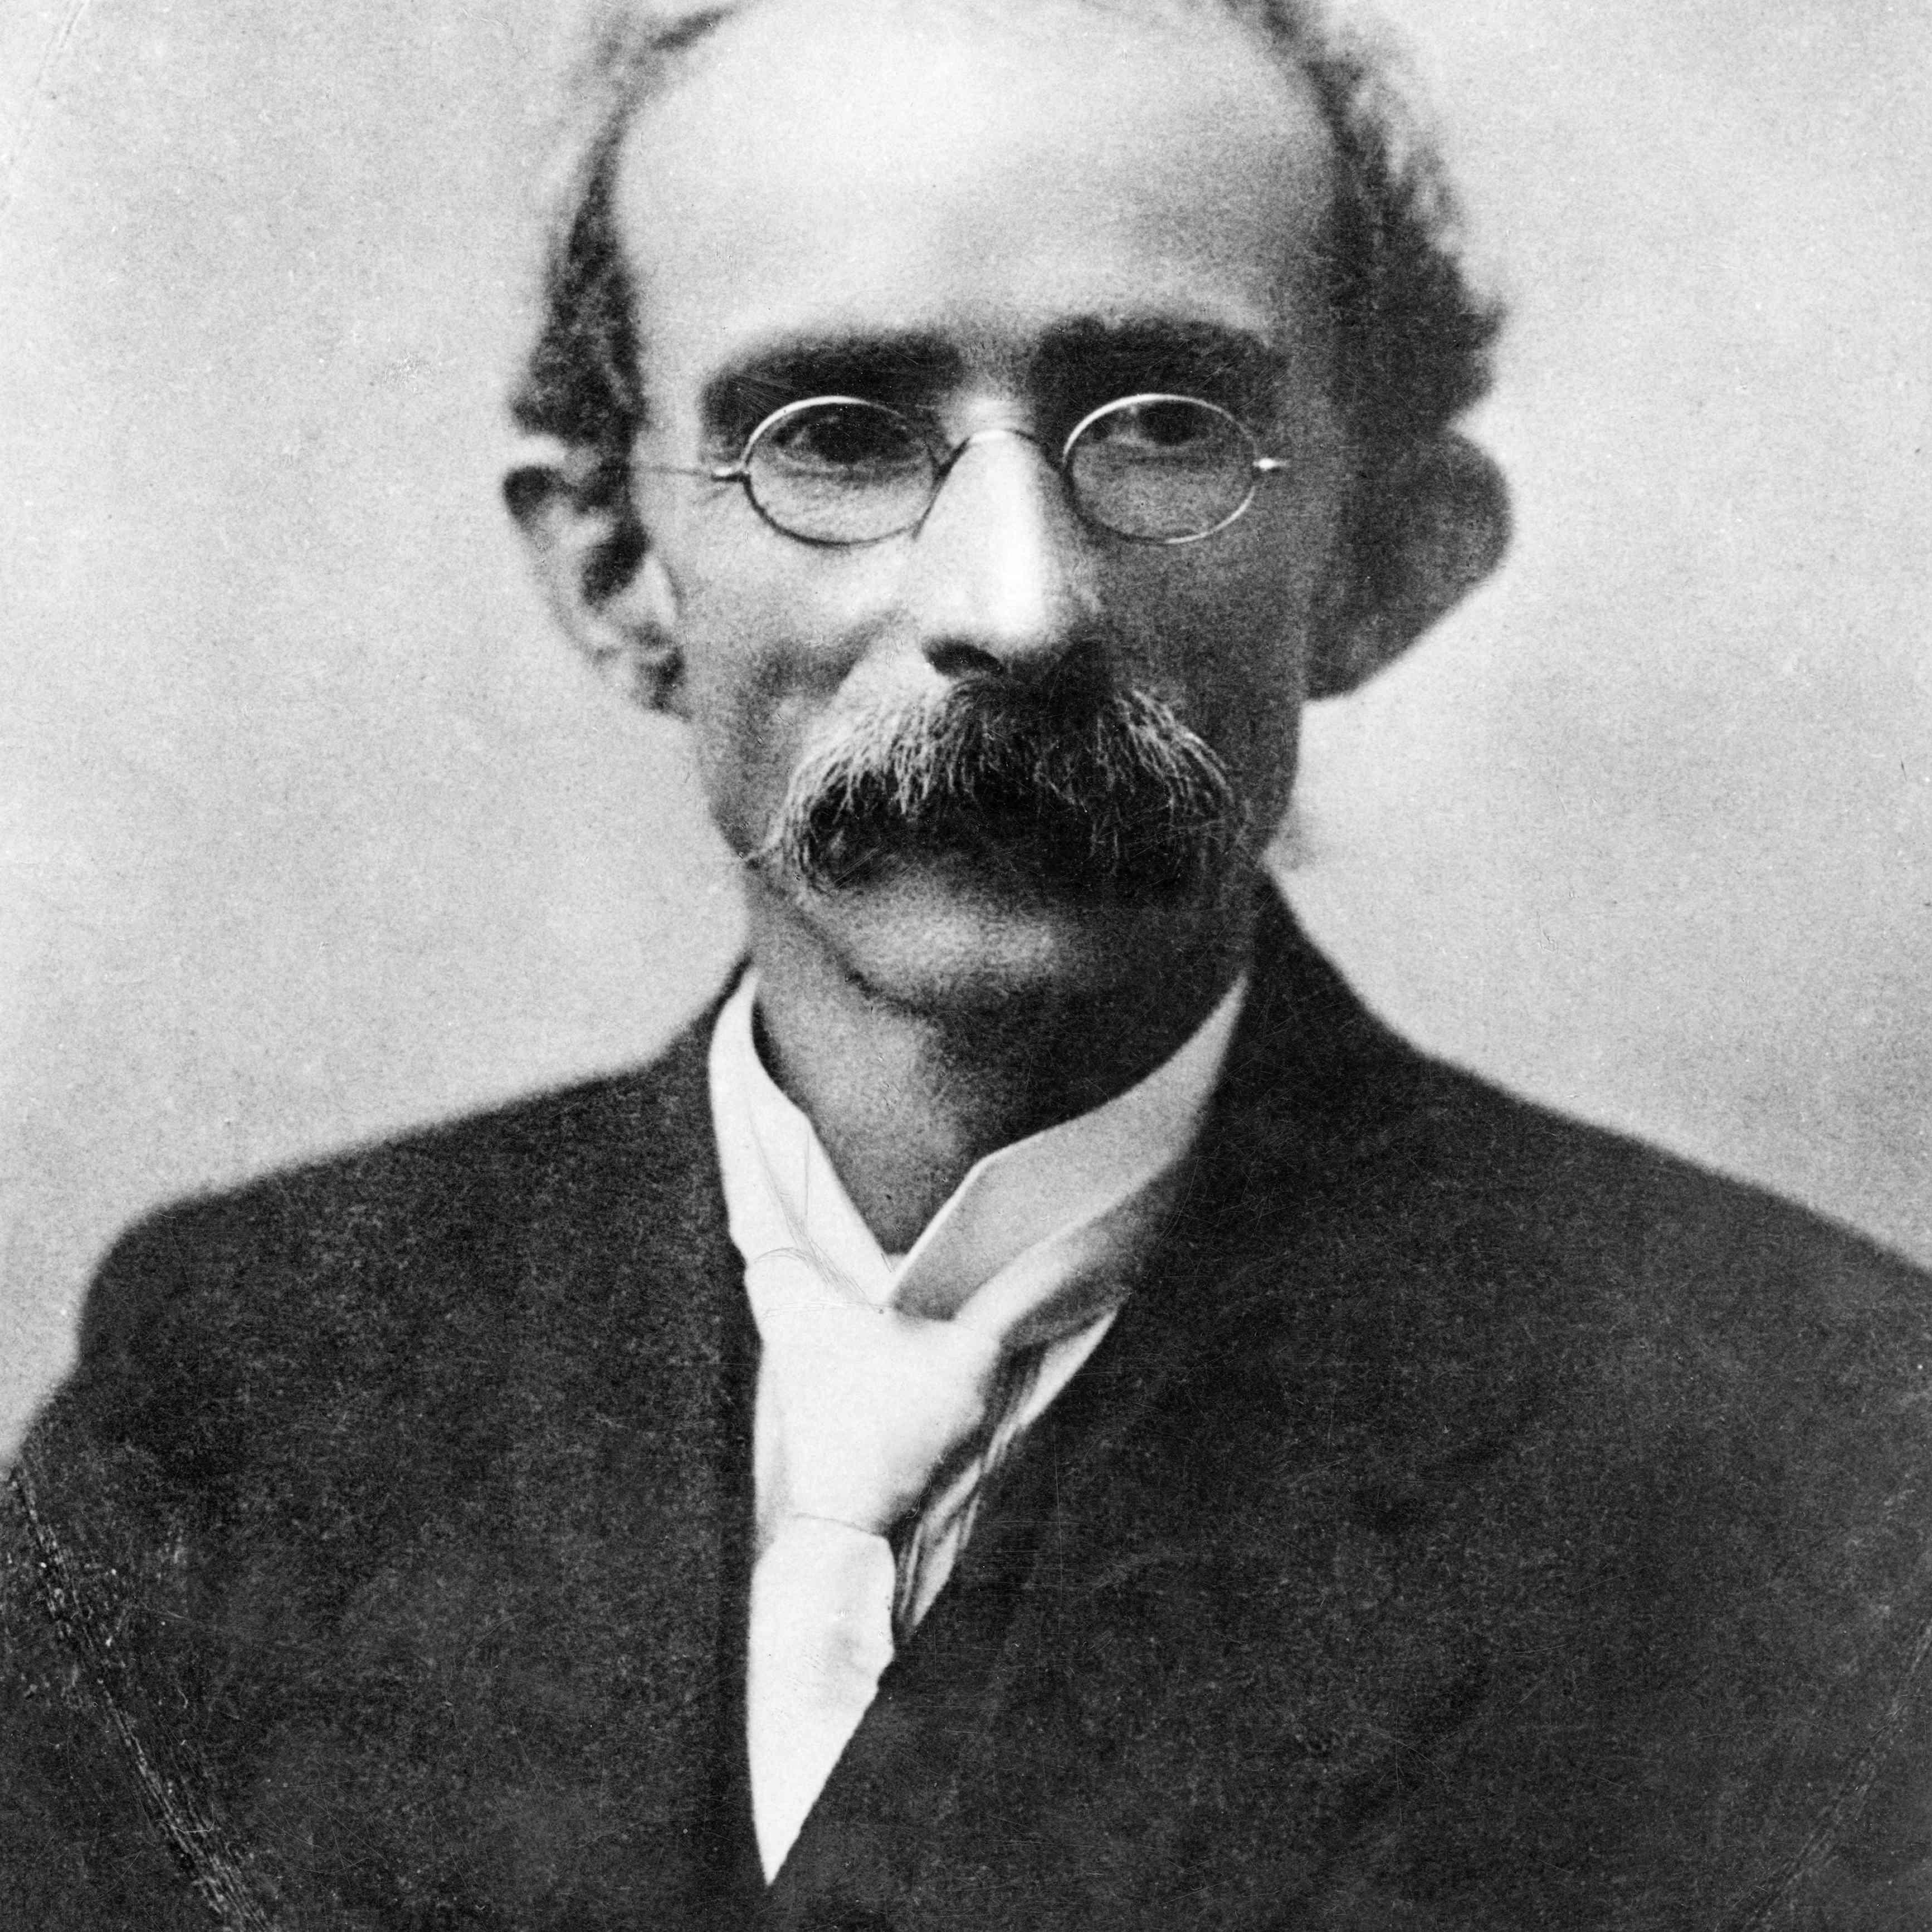 photograph of Irish rebel leader Thomas Clarke